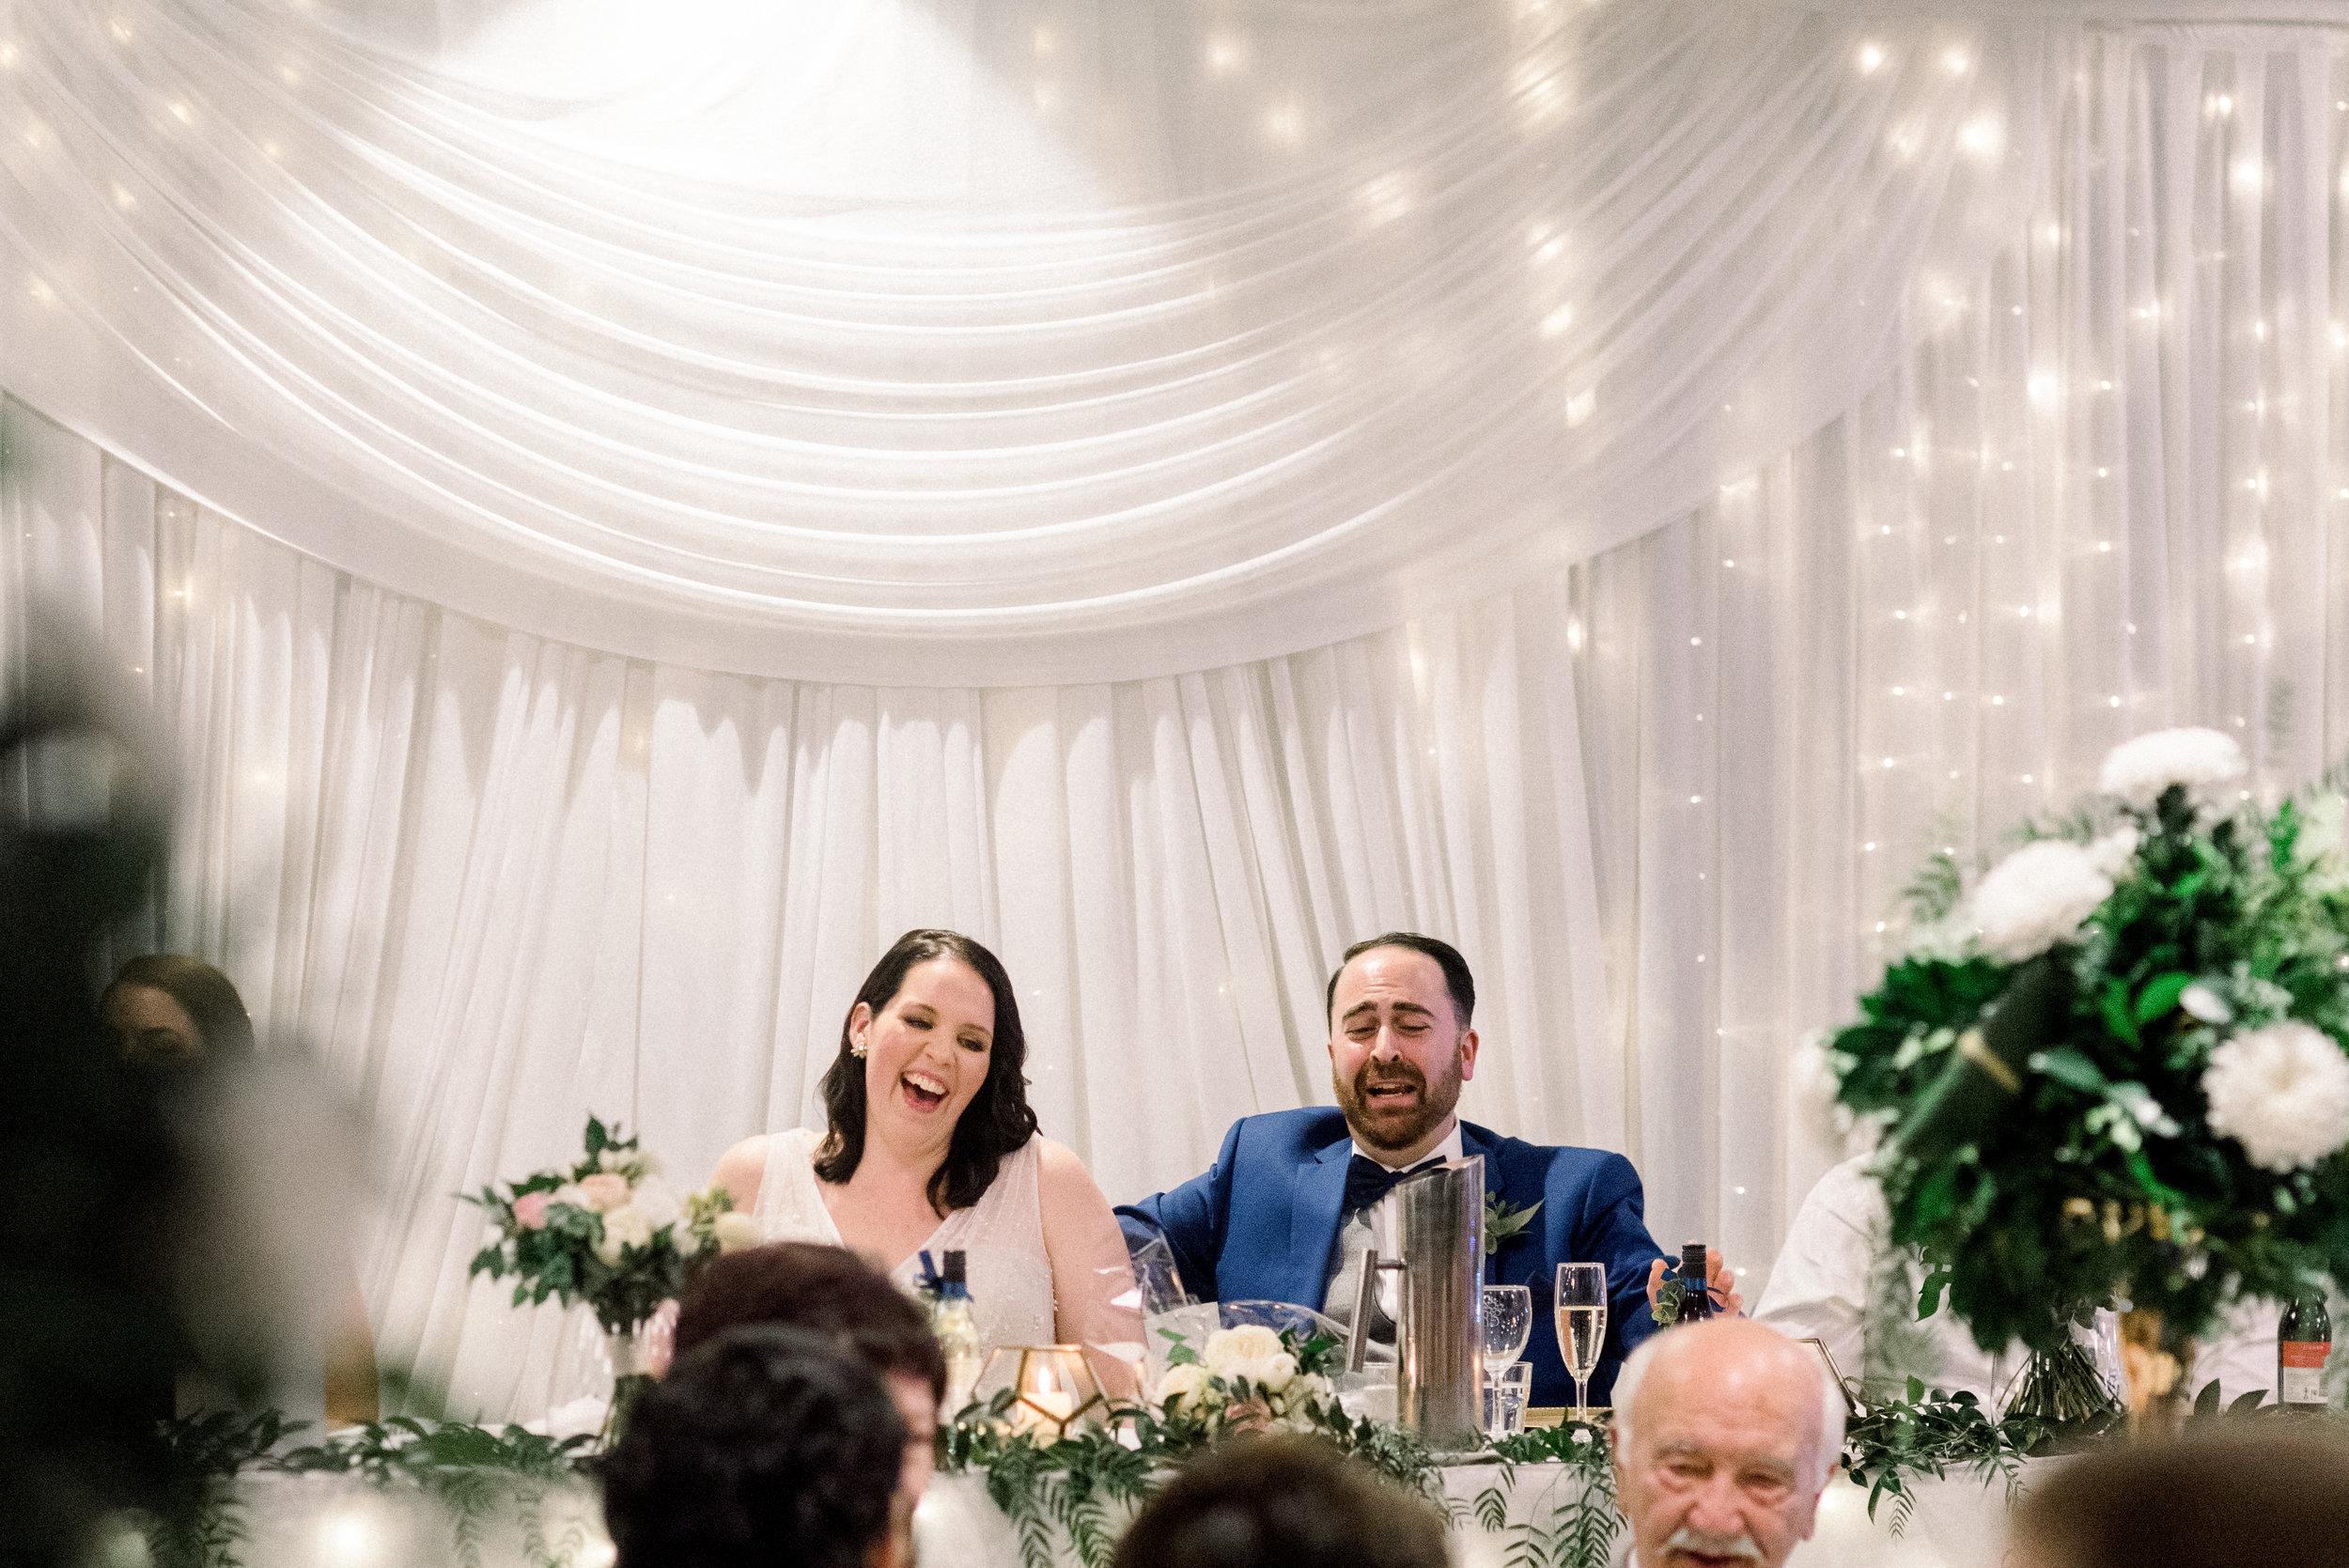 brisbane-city-wedding-photographer-romantic-wedding-95.jpg